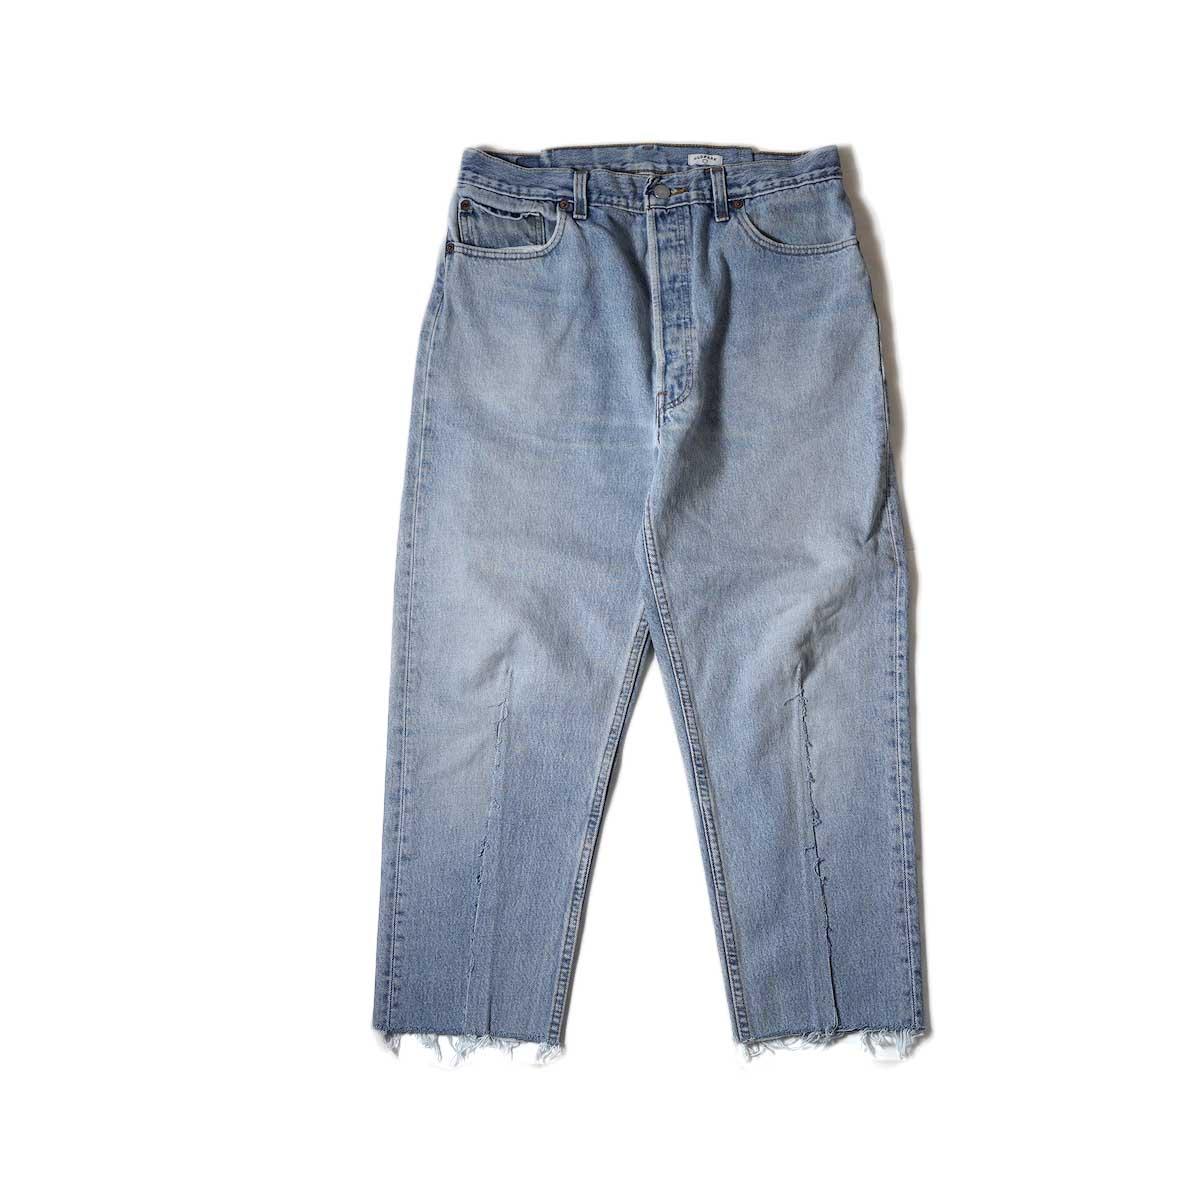 OLD PARK / Balloon Jeans (Blue) Msize-C